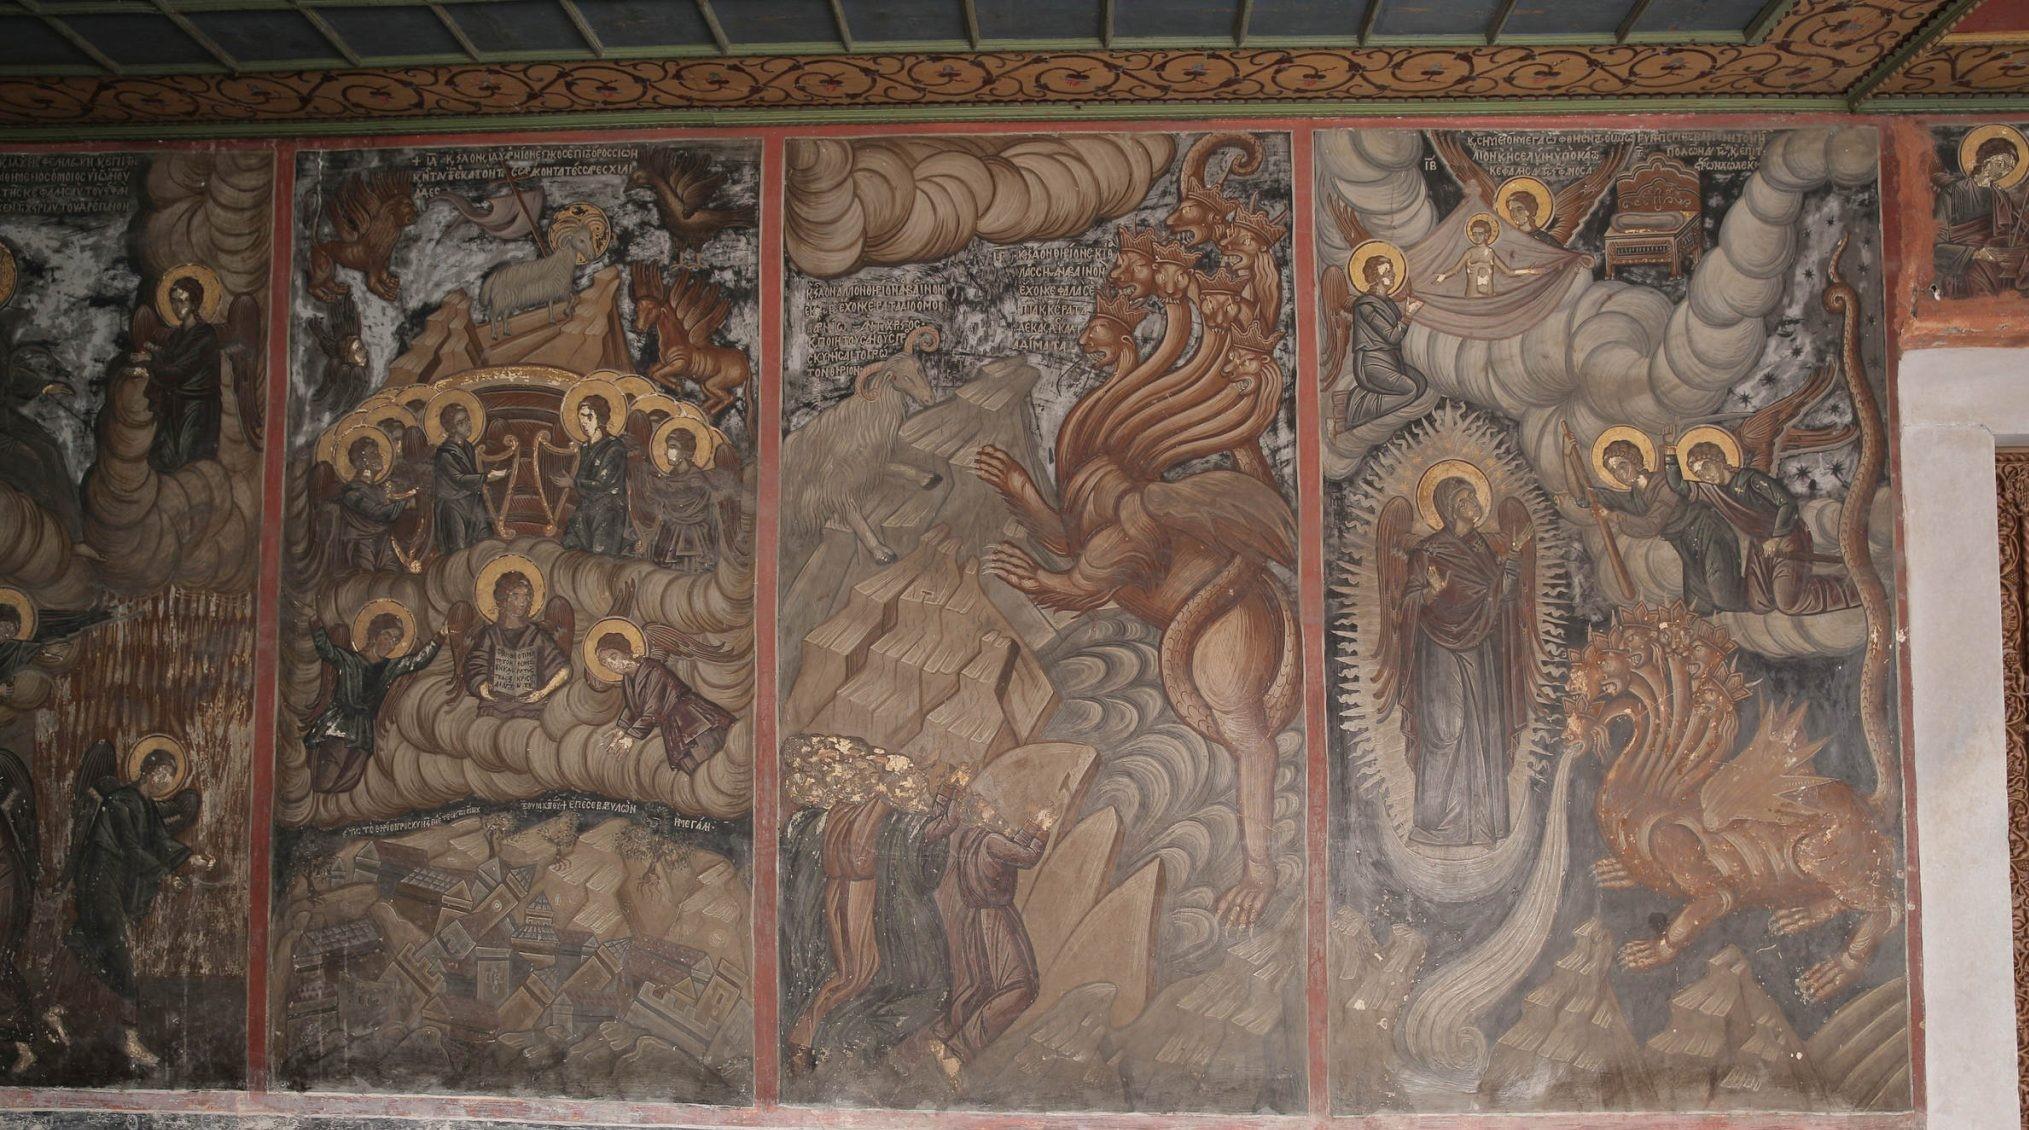 Mount Athos paintings of Apocalypse